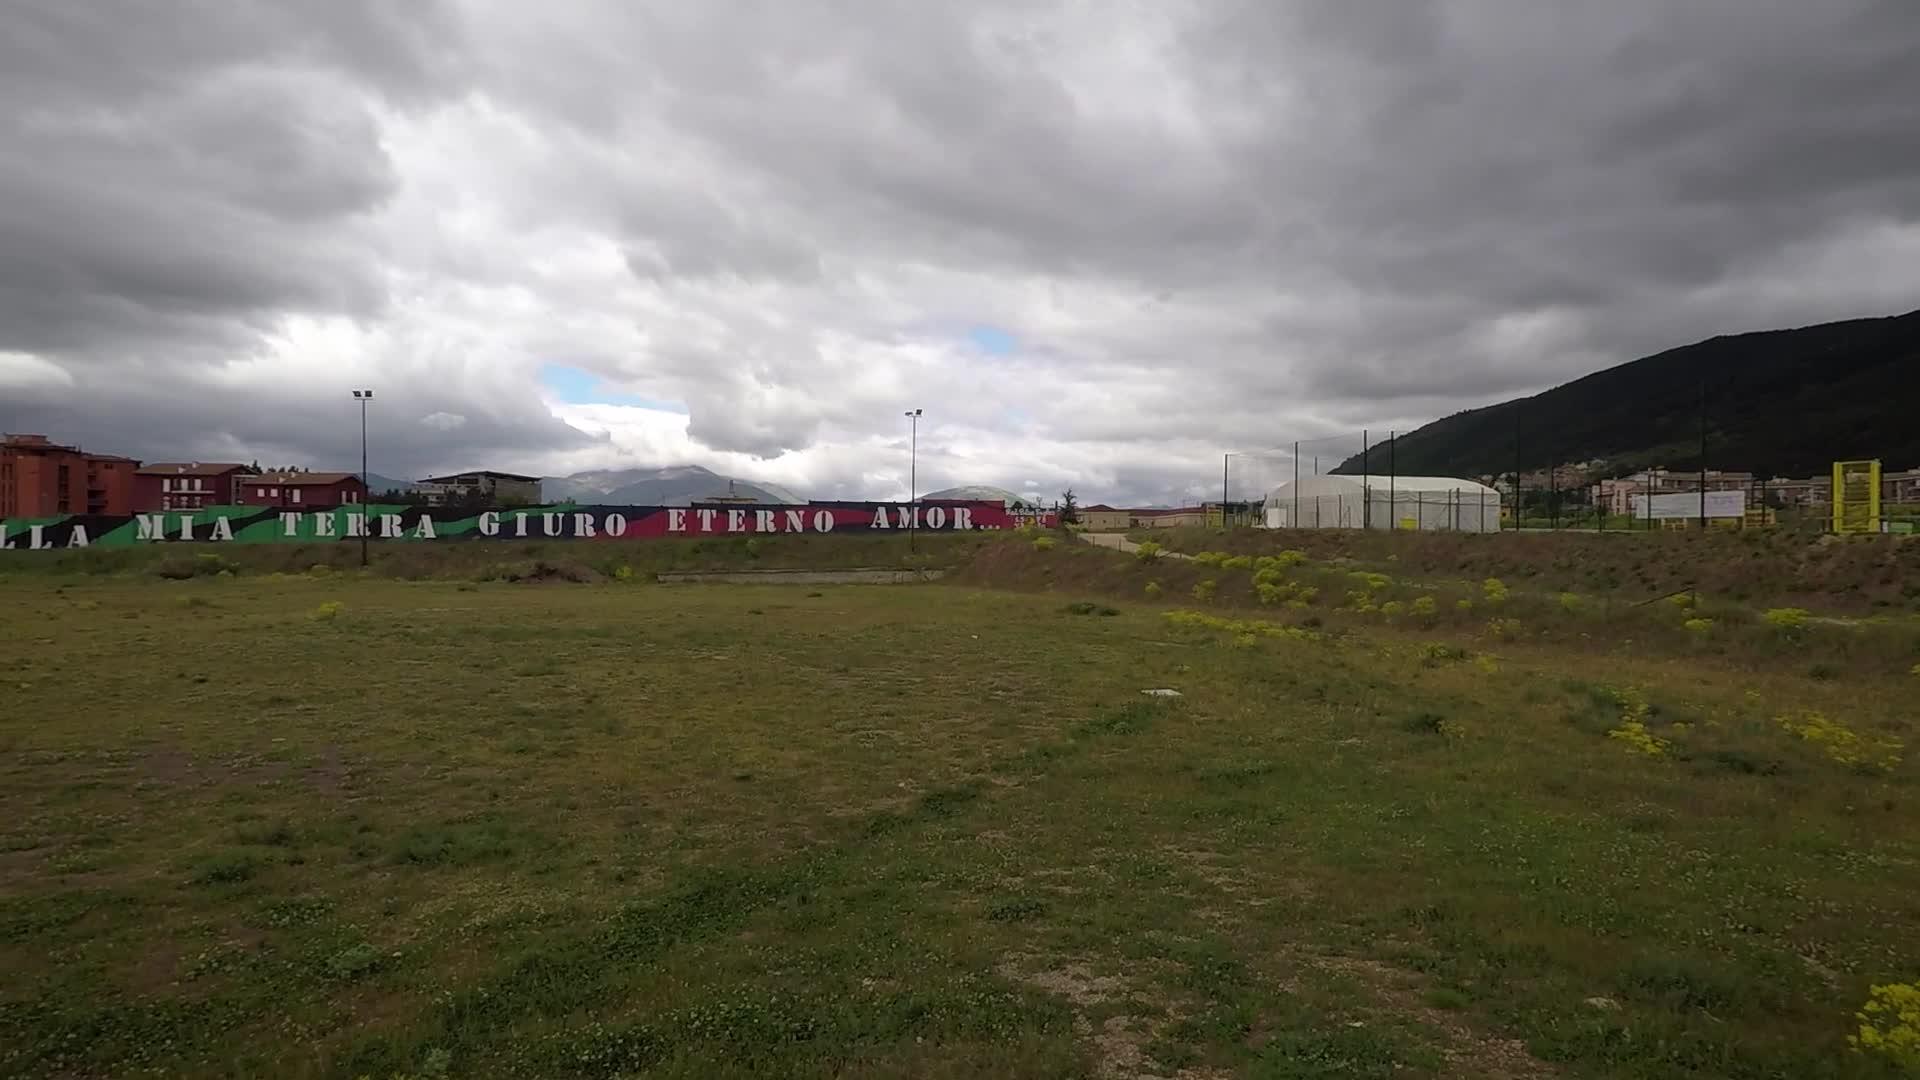 Drone View - L'Aquila City